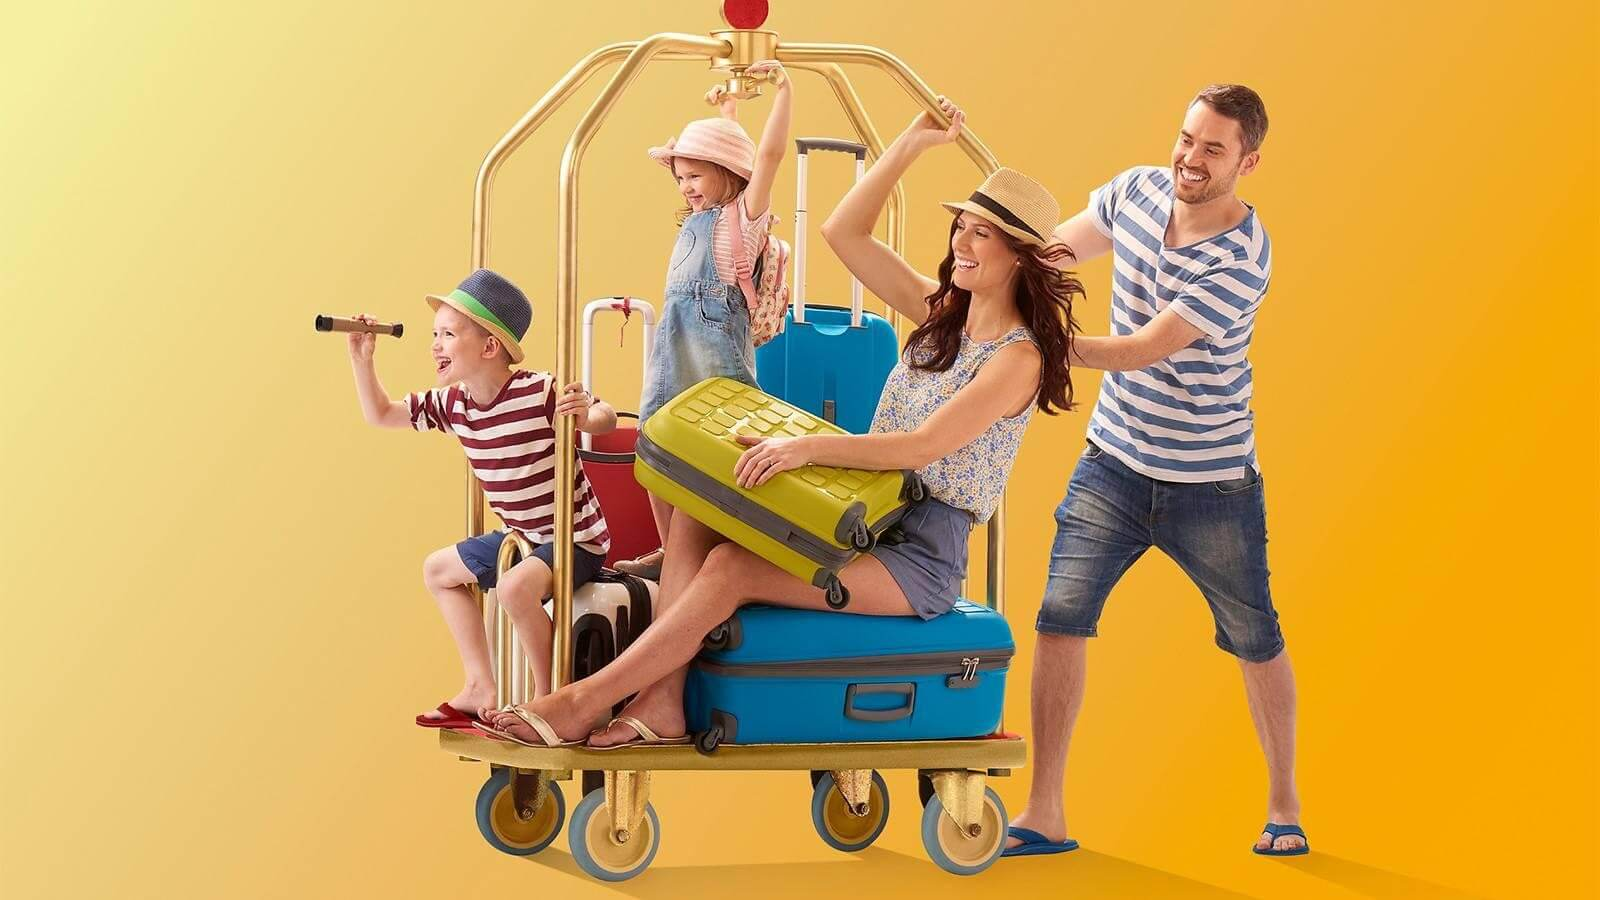 Family Holiday Trip